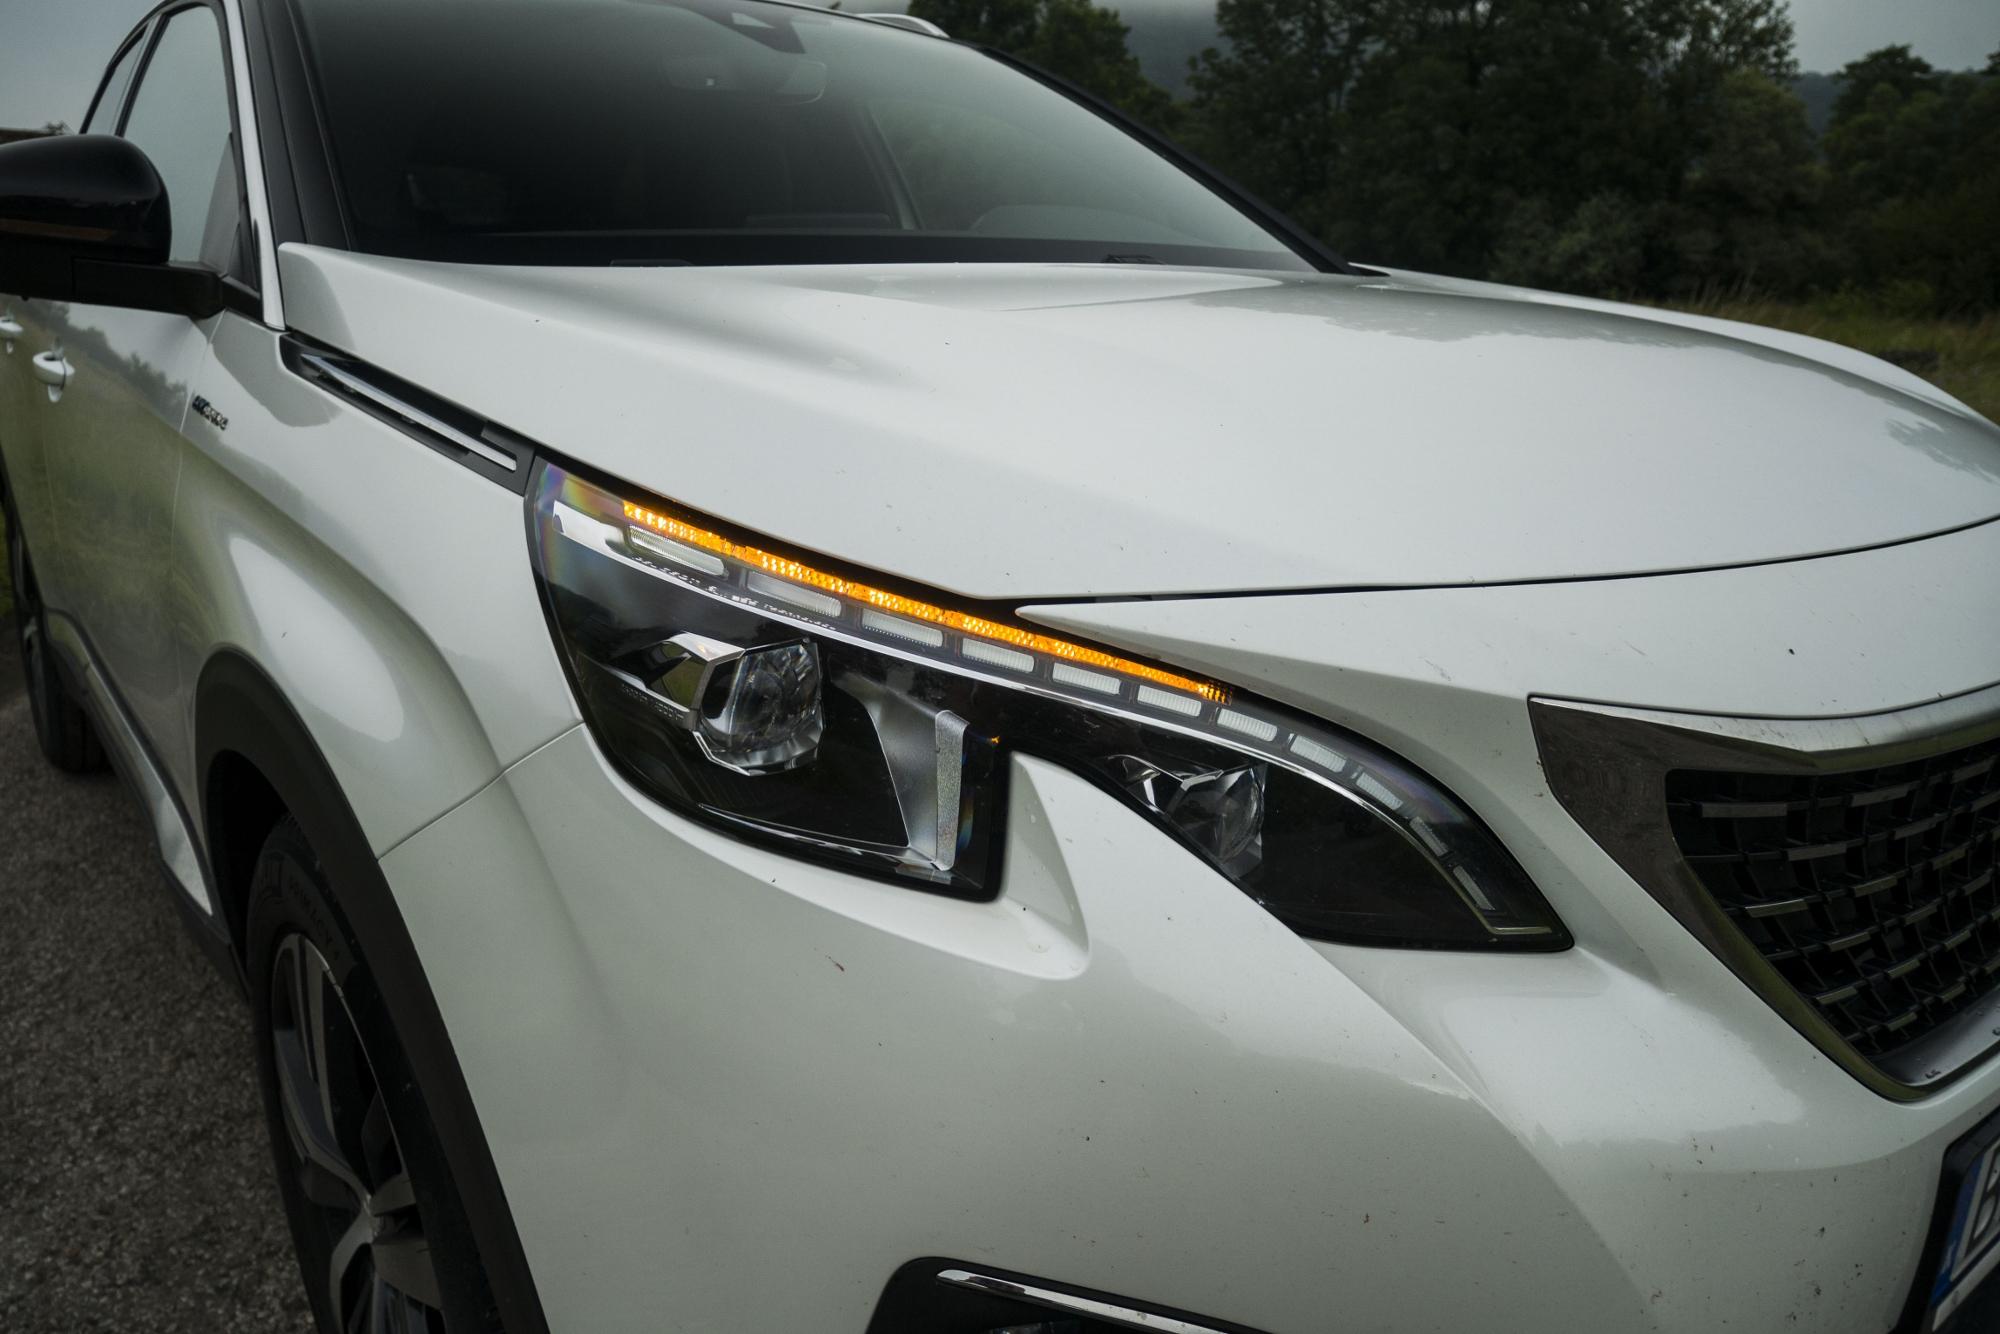 Test: Peugeot 3008 posúva schopnosti plug in hybridov NPlhJVIzRZ peugeot-3008-hybrid4-4